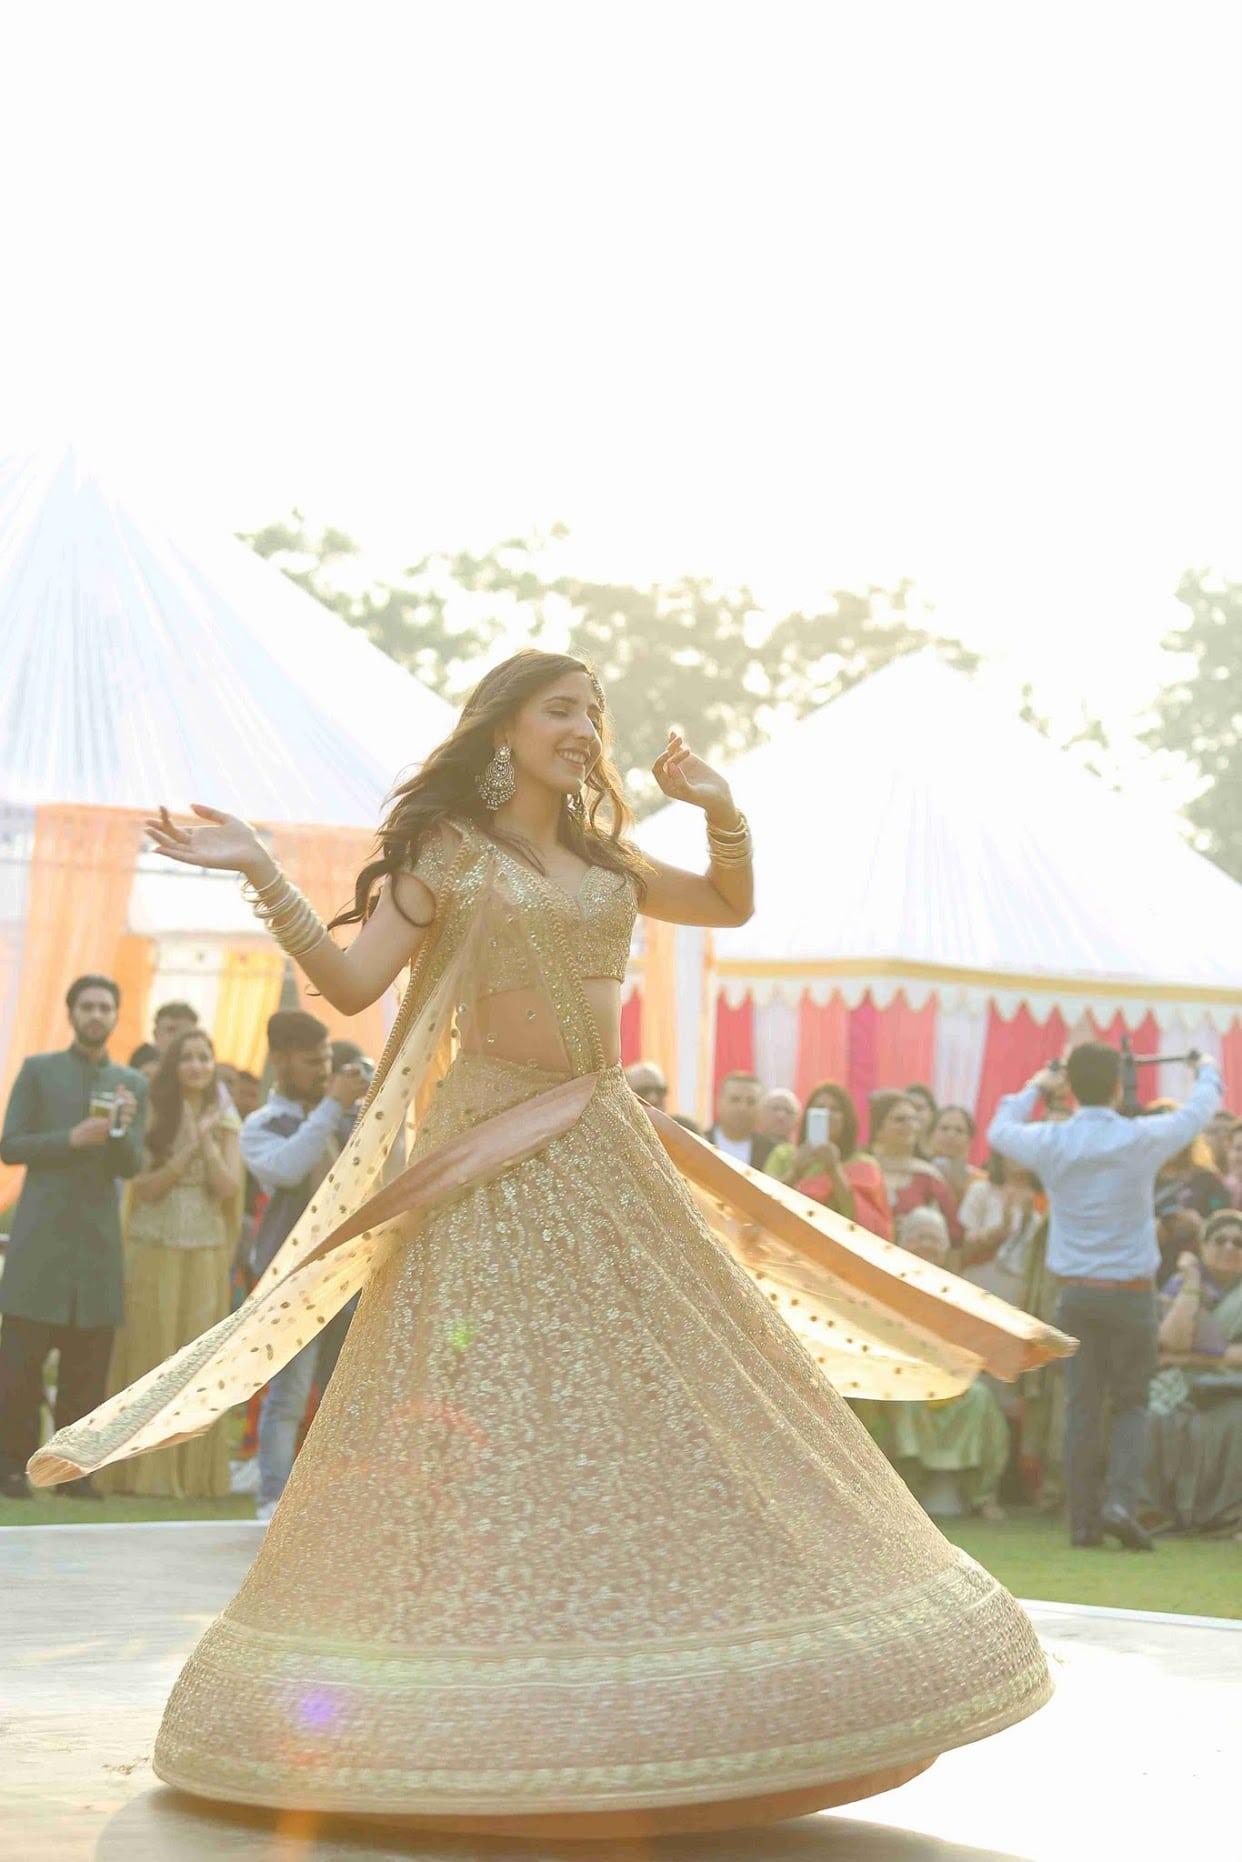 the charming bride!:tarun tahiliani, rajkamal studio, jasmeet kapany hair and makeup